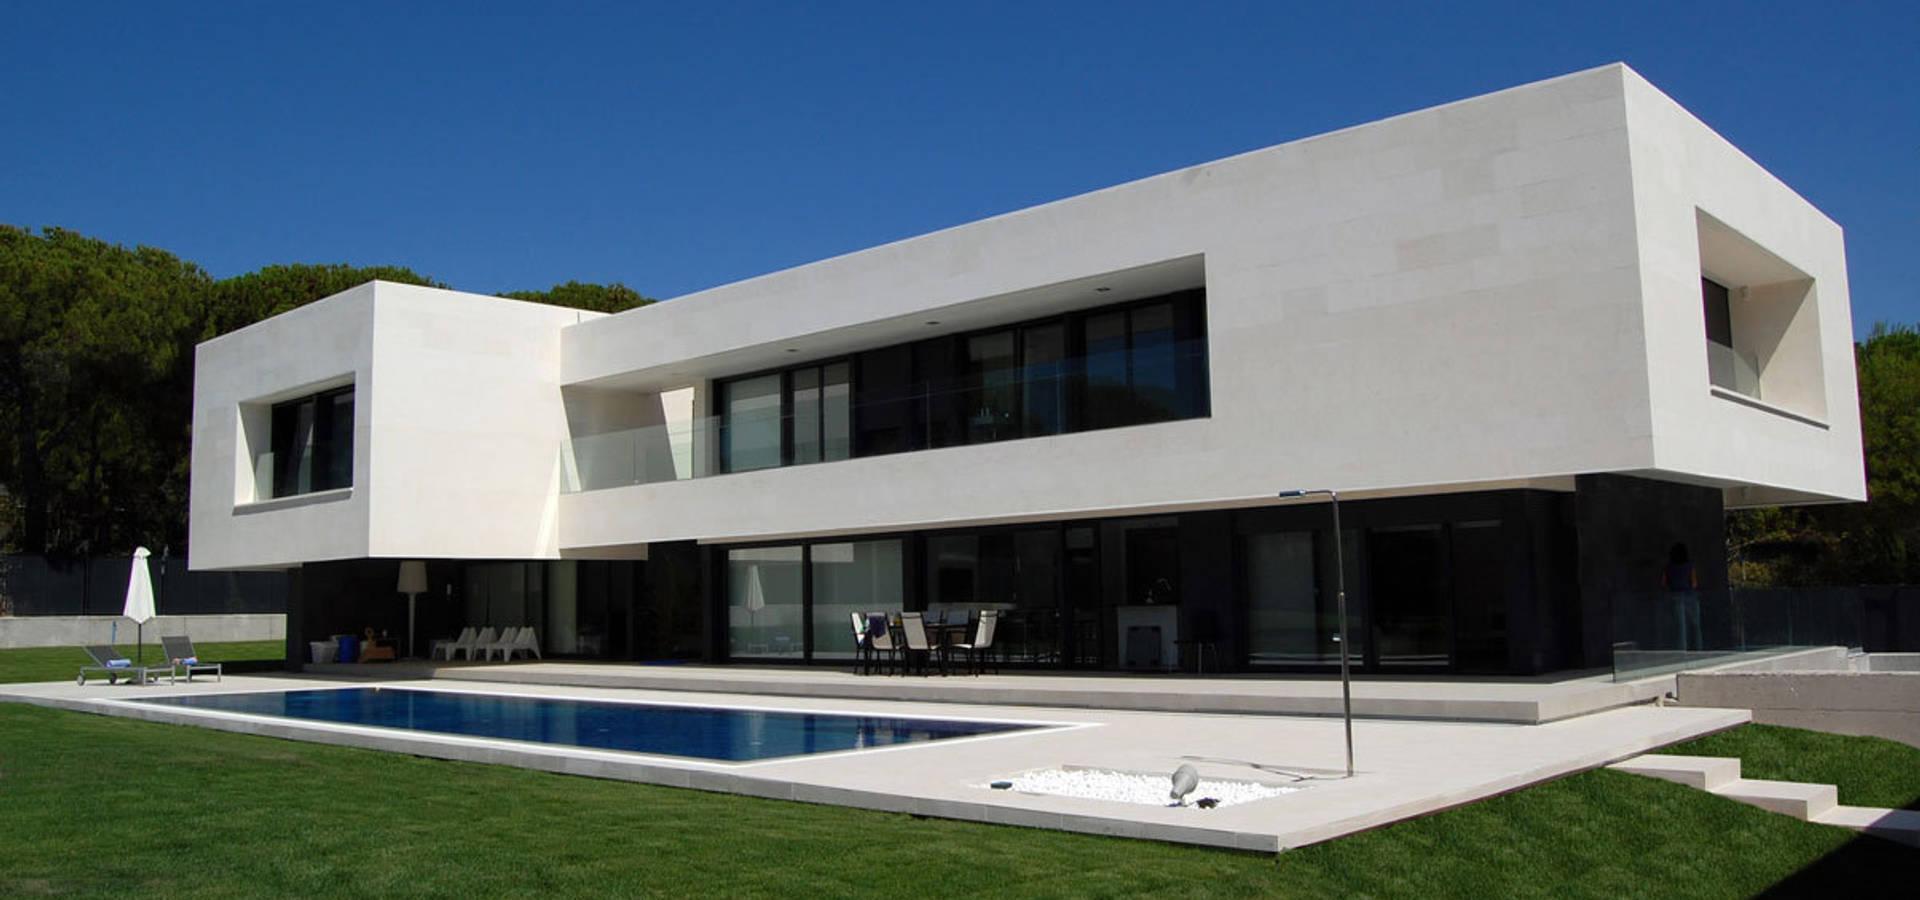 Marta gonz lez arquitectos arquitectos en madrid homify - Marta gonzalez arquitecto ...